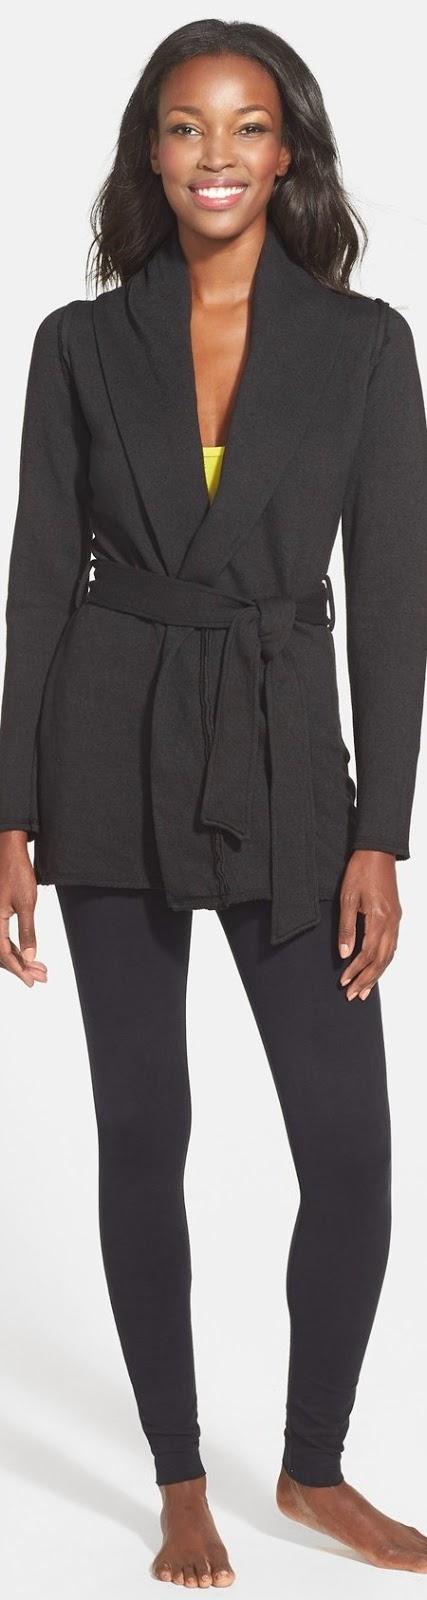 Omgirl 'Modern' Wrap Cardigan and leggings